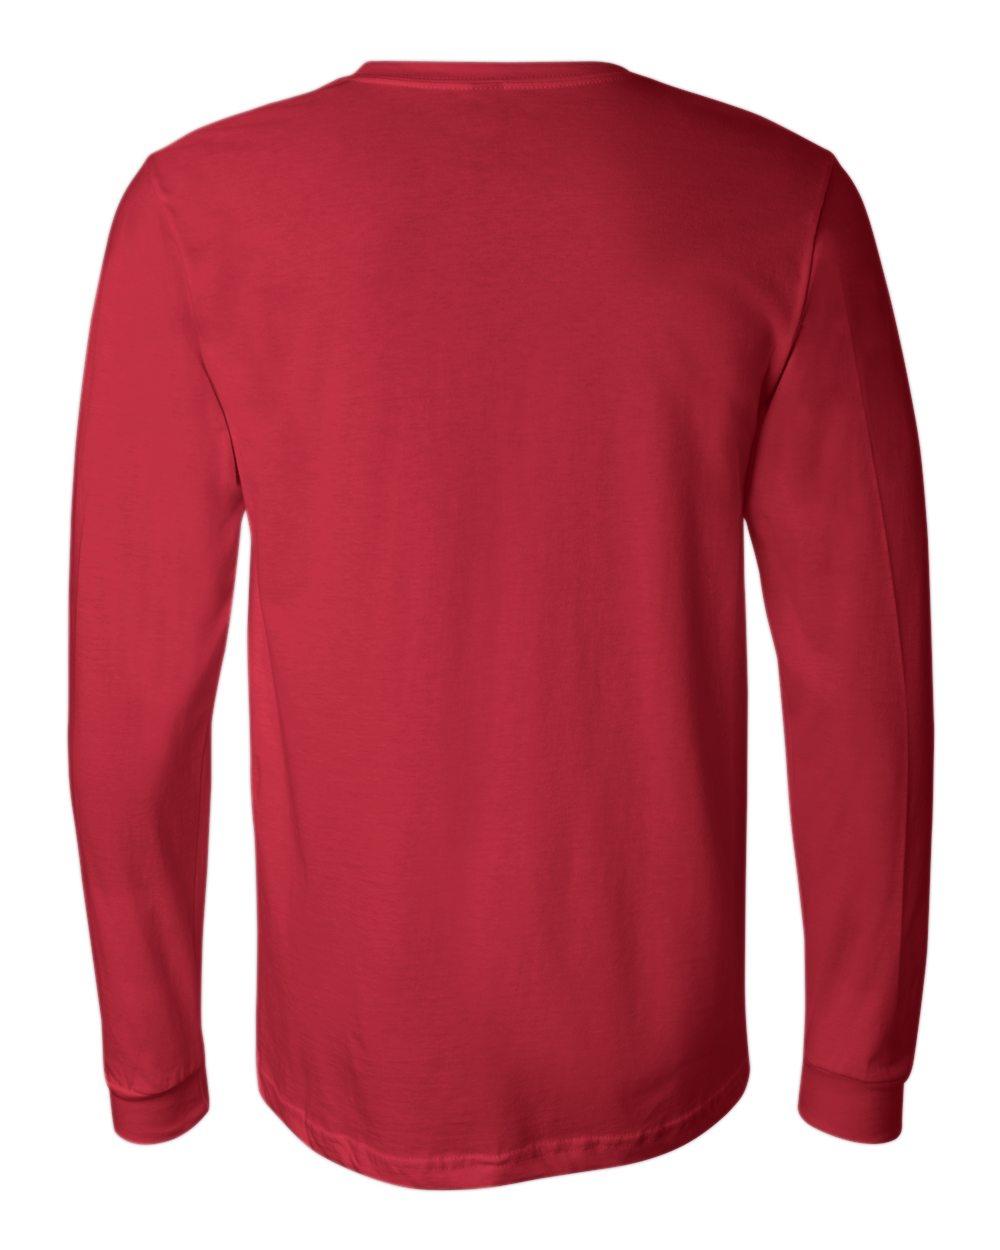 Bella-Canvas-Mens-Blank-Top-Long-Sleeve-Jersey-Tee-T-Shirt-3501-up-to-3XL thumbnail 98